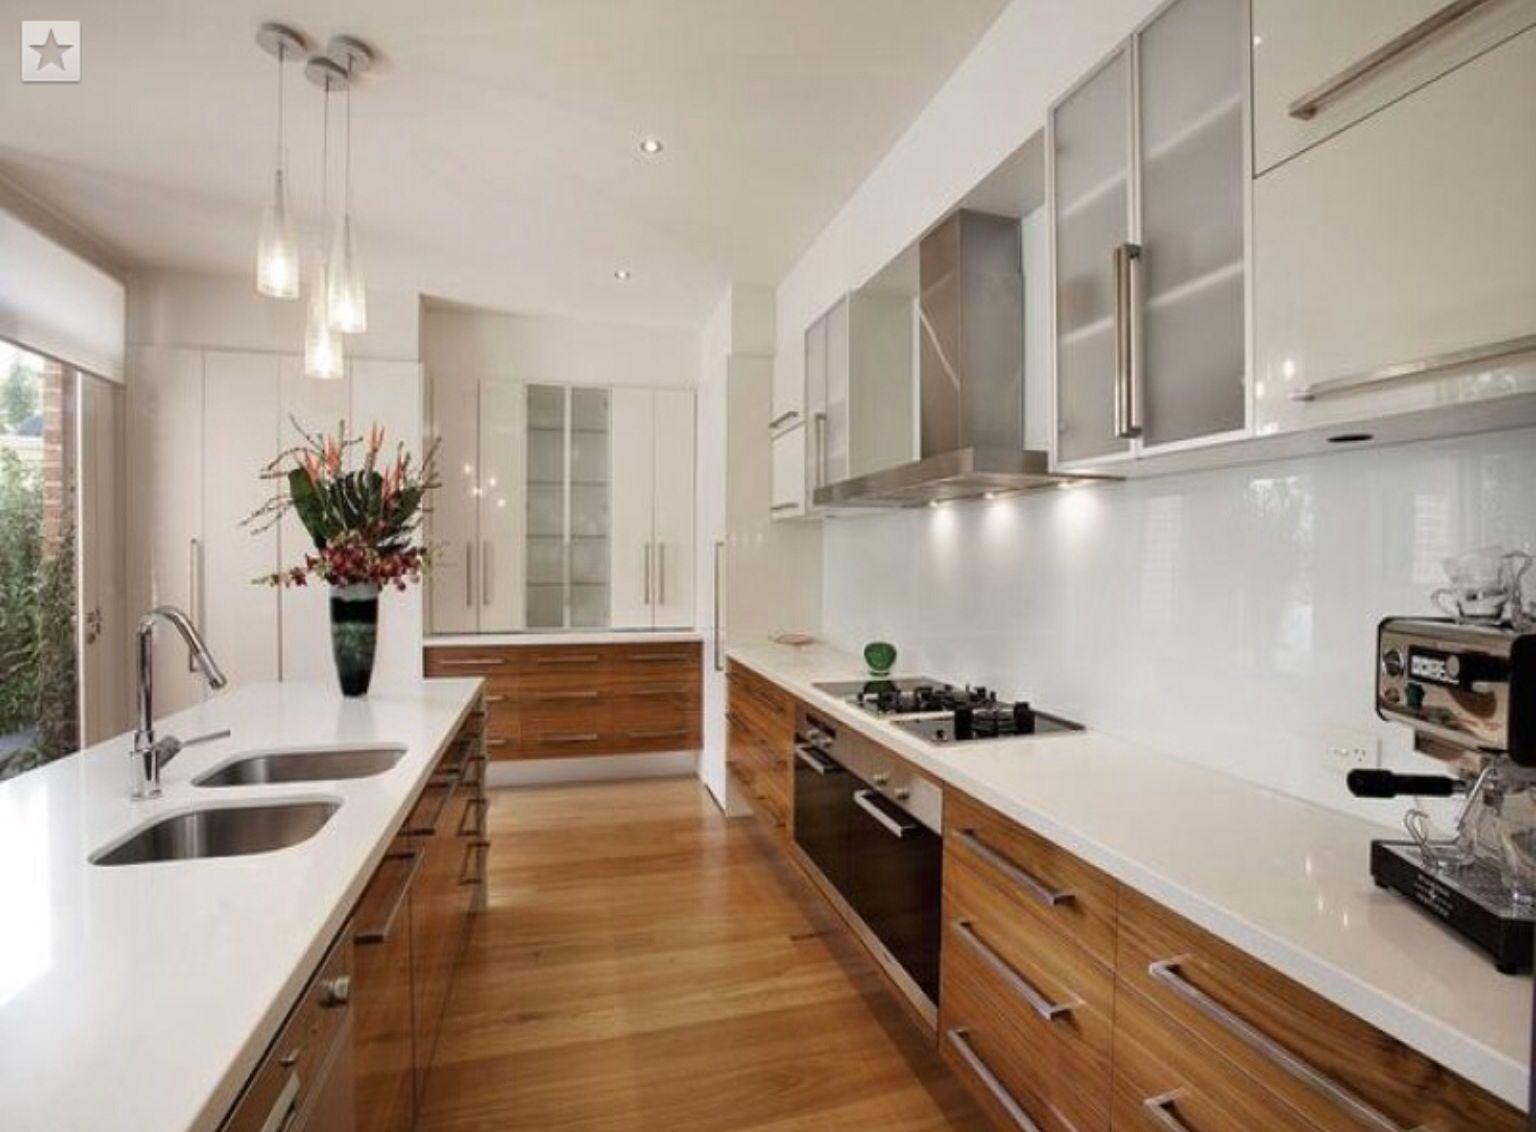 10 X 16 Kitchen Design Galley Kitchen Design  Kitchen & Dining  Pinterest  Kitchens